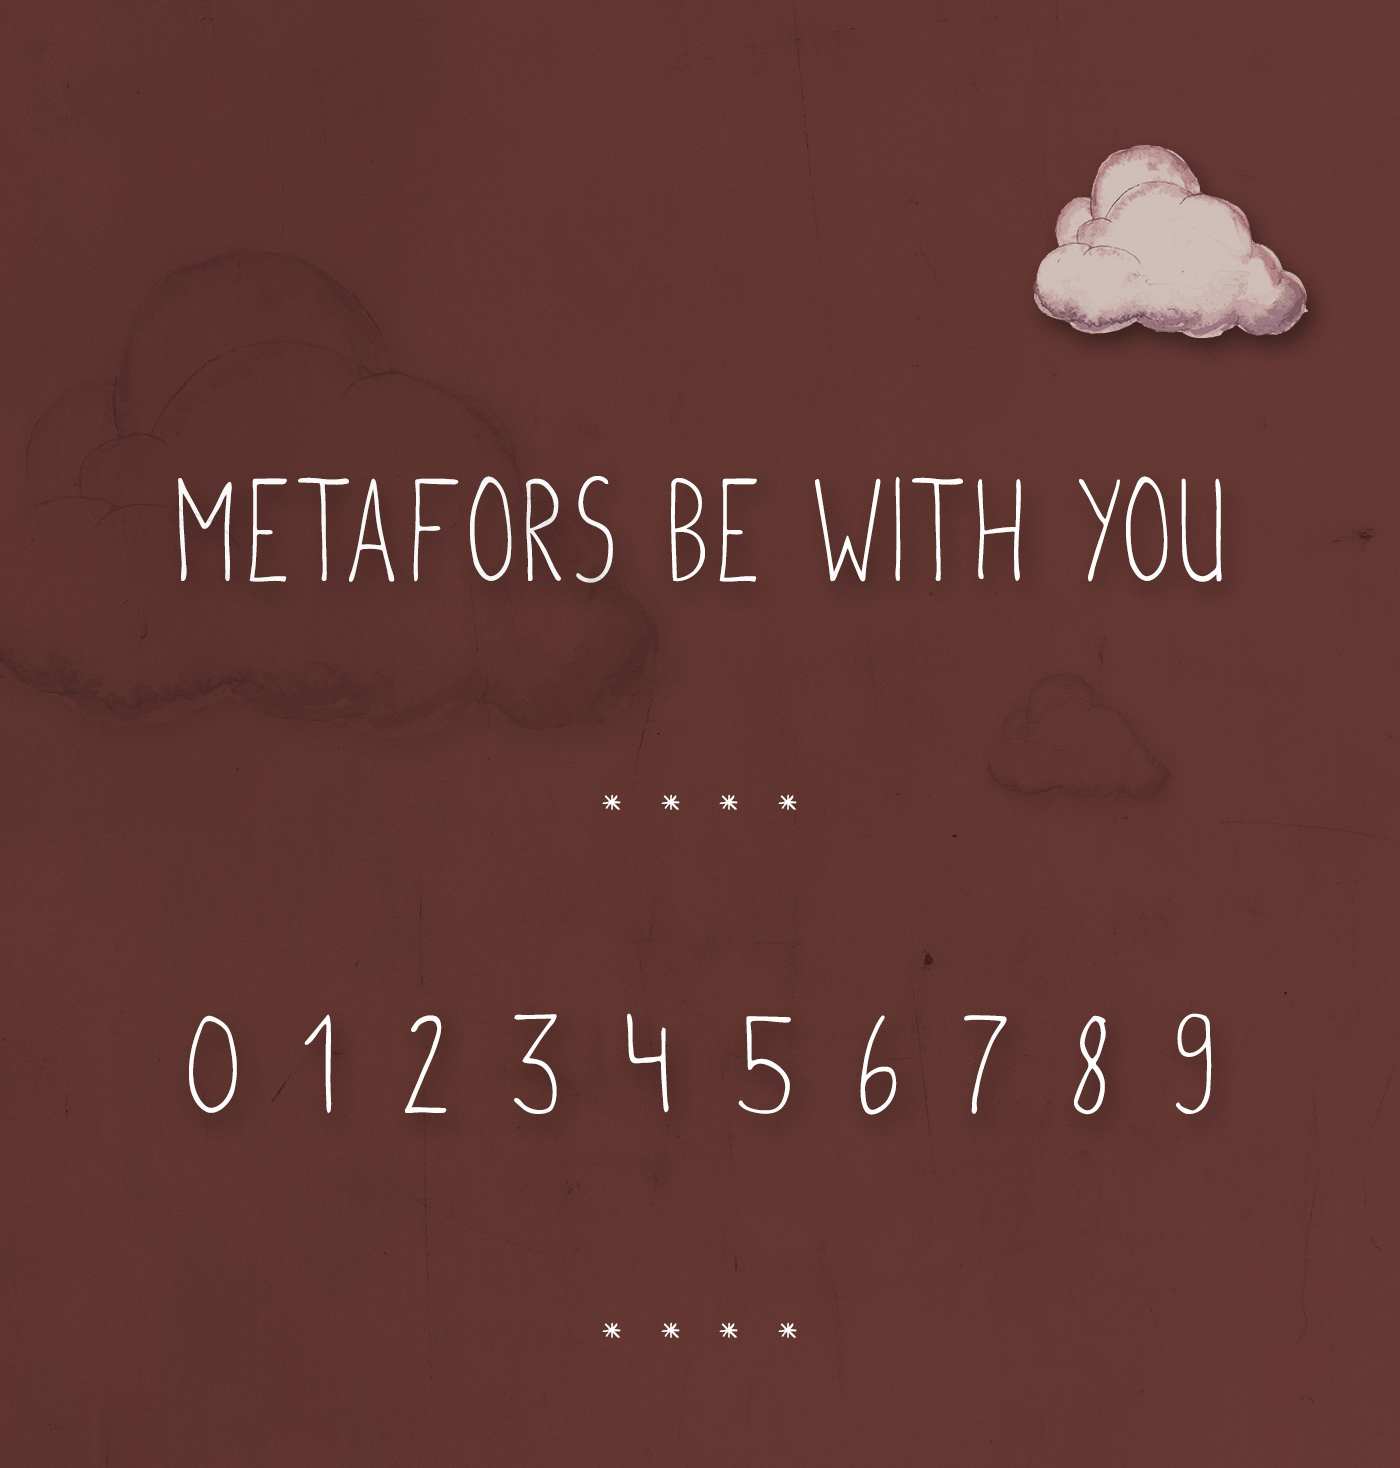 hand-drawn-font-metafors-2